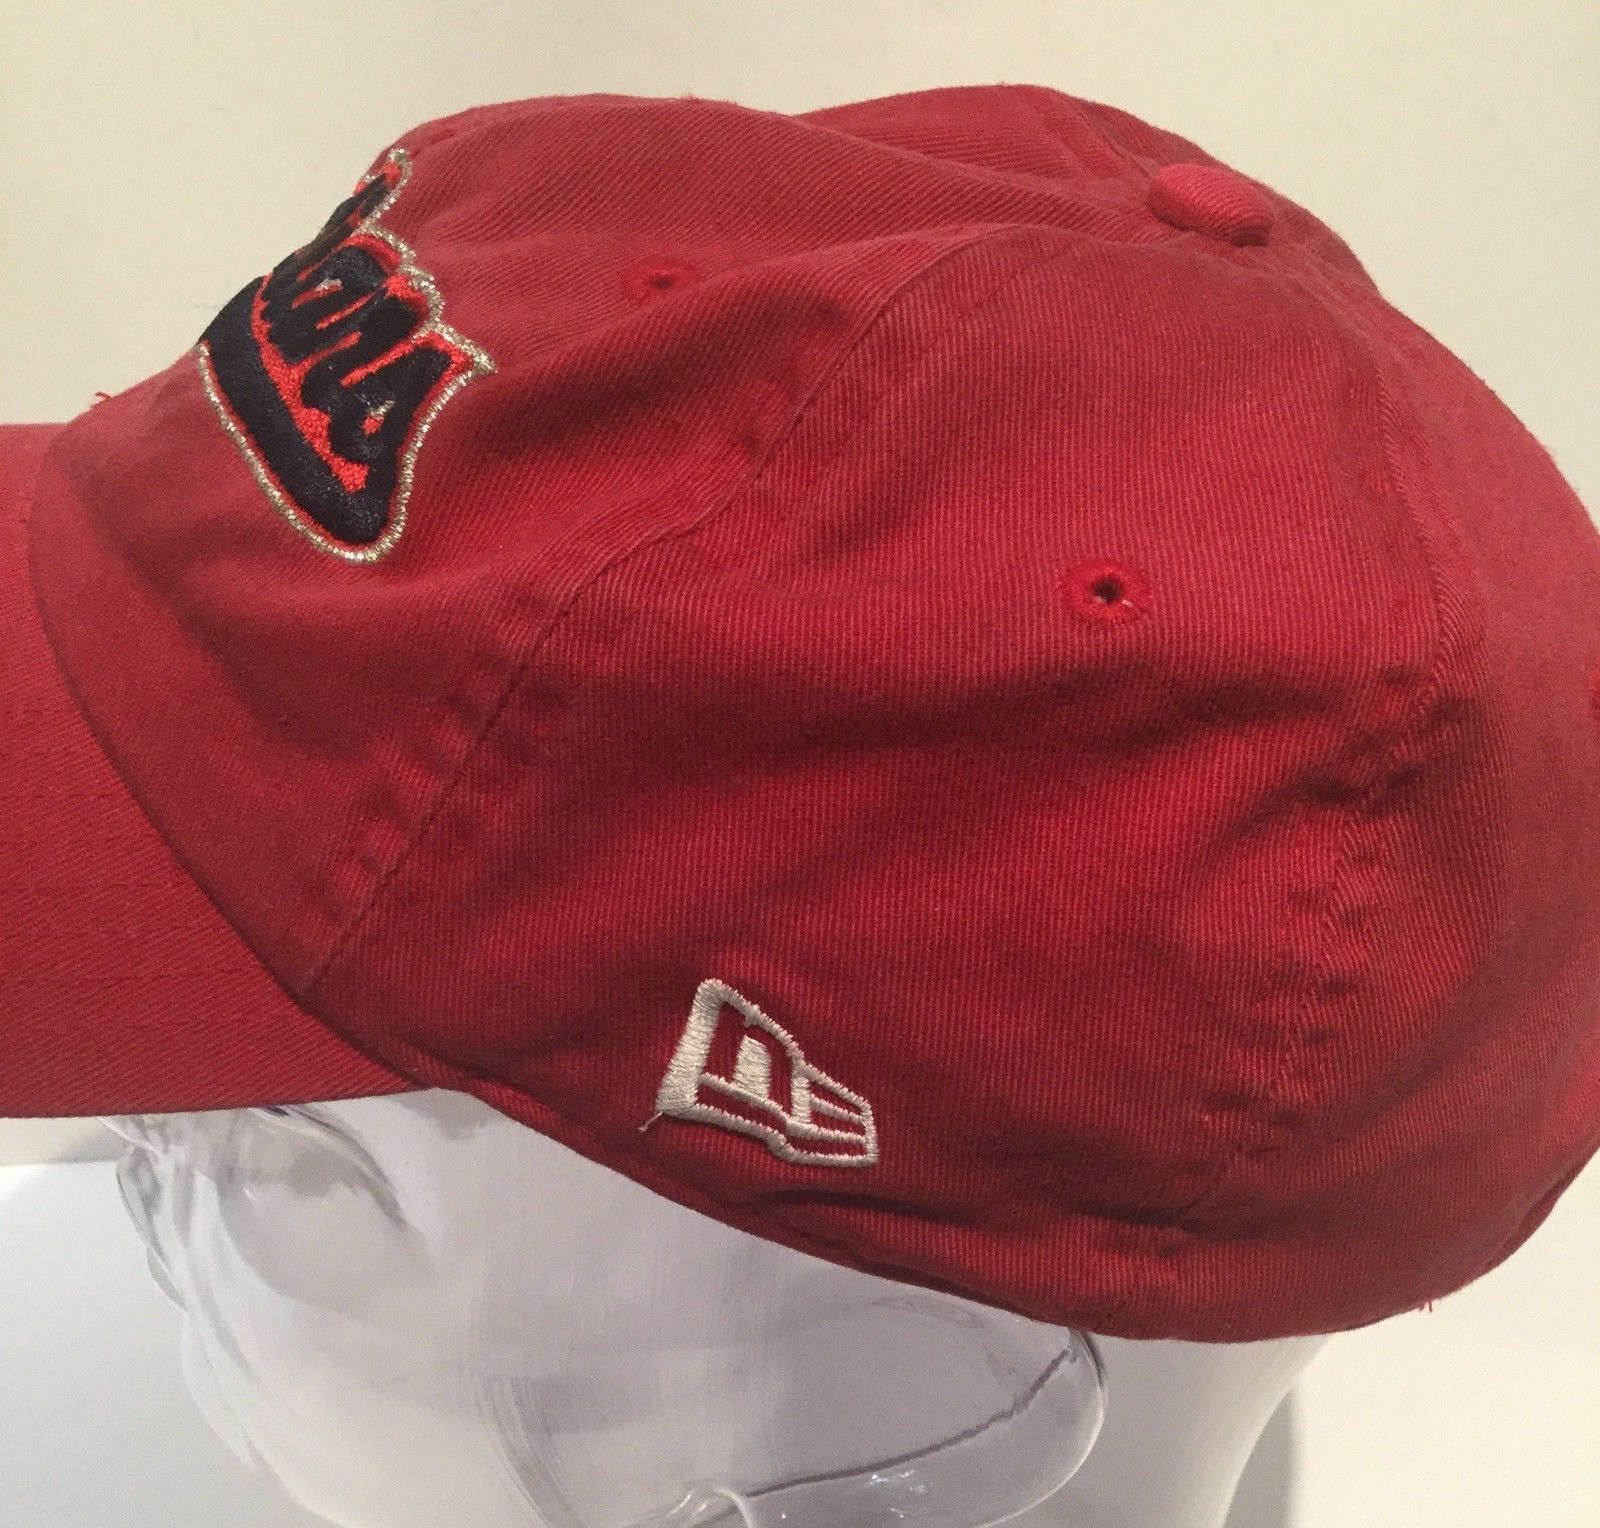 Cleveland Red Script Indians Baseball Hat Cap Adjustable Cloth Strap Clean EUC